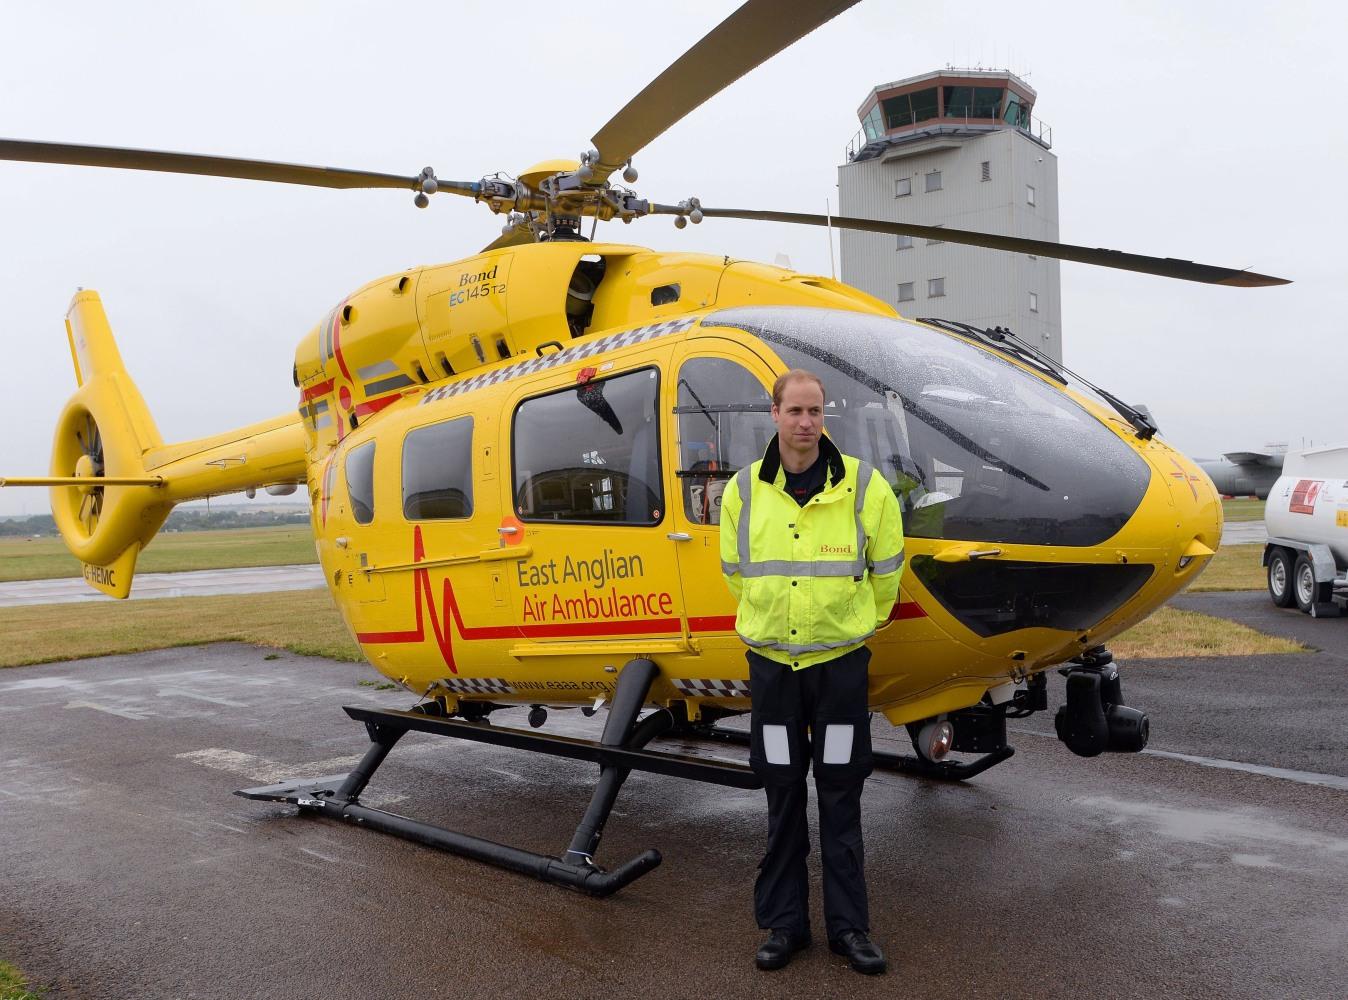 Prince William leaves pilot job for United Kingdom royal duties